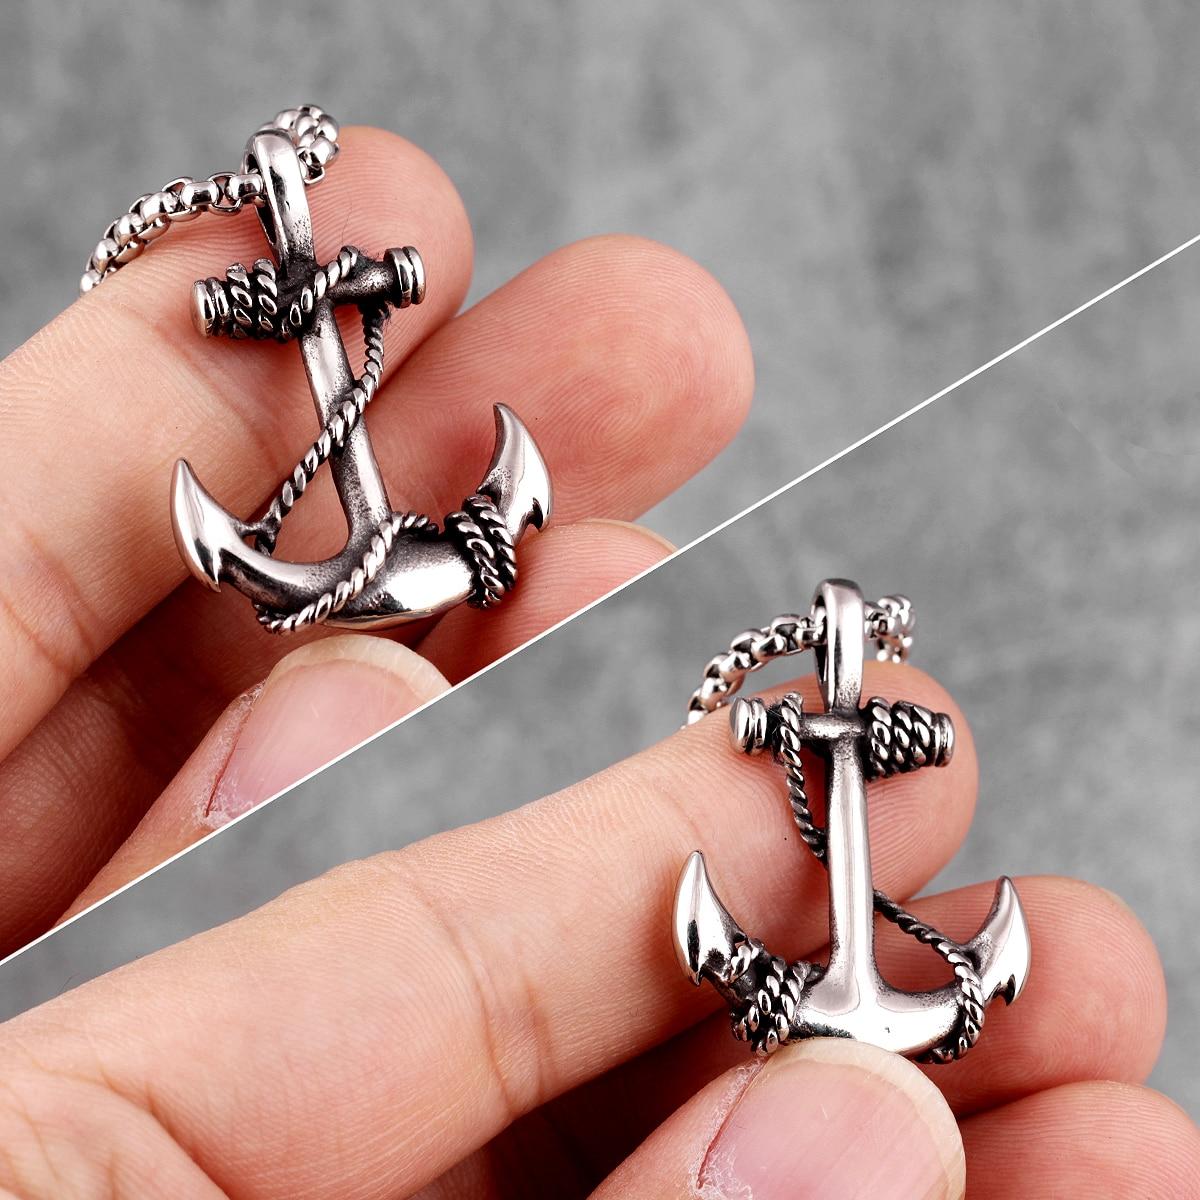 Stainless Steel Sea Anchor Sailor Man Men Necklaces Chain Pendants Punk Rock Hip Hop Unique for Male Boy Fashion Jewelry Gift